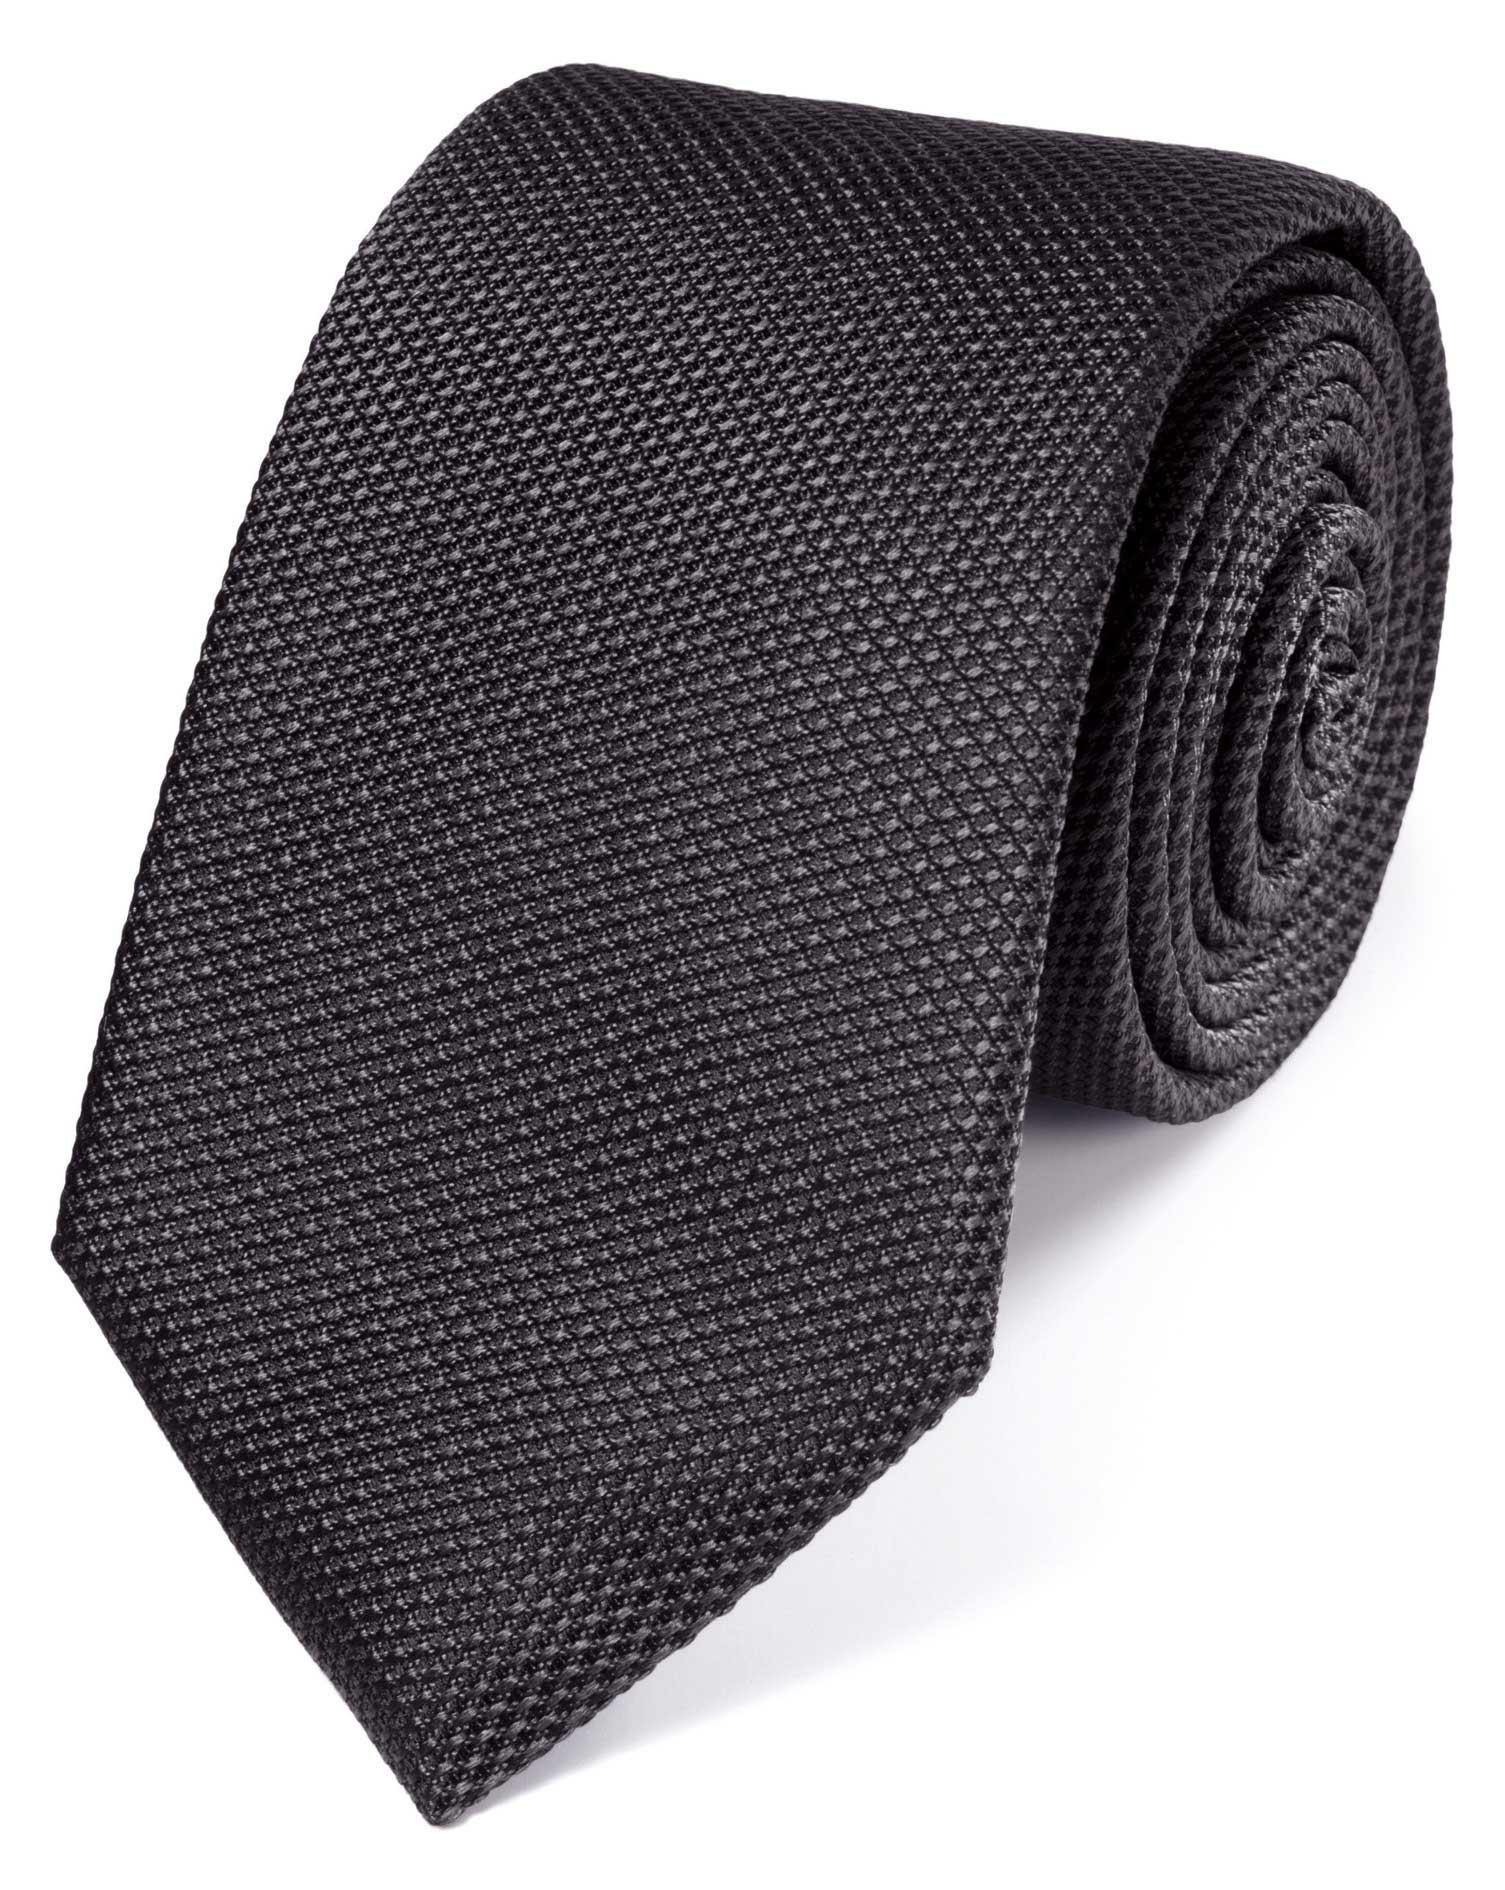 Charcoal Silk Plain Classic Tie Size OSFA by Charles Tyrwhitt